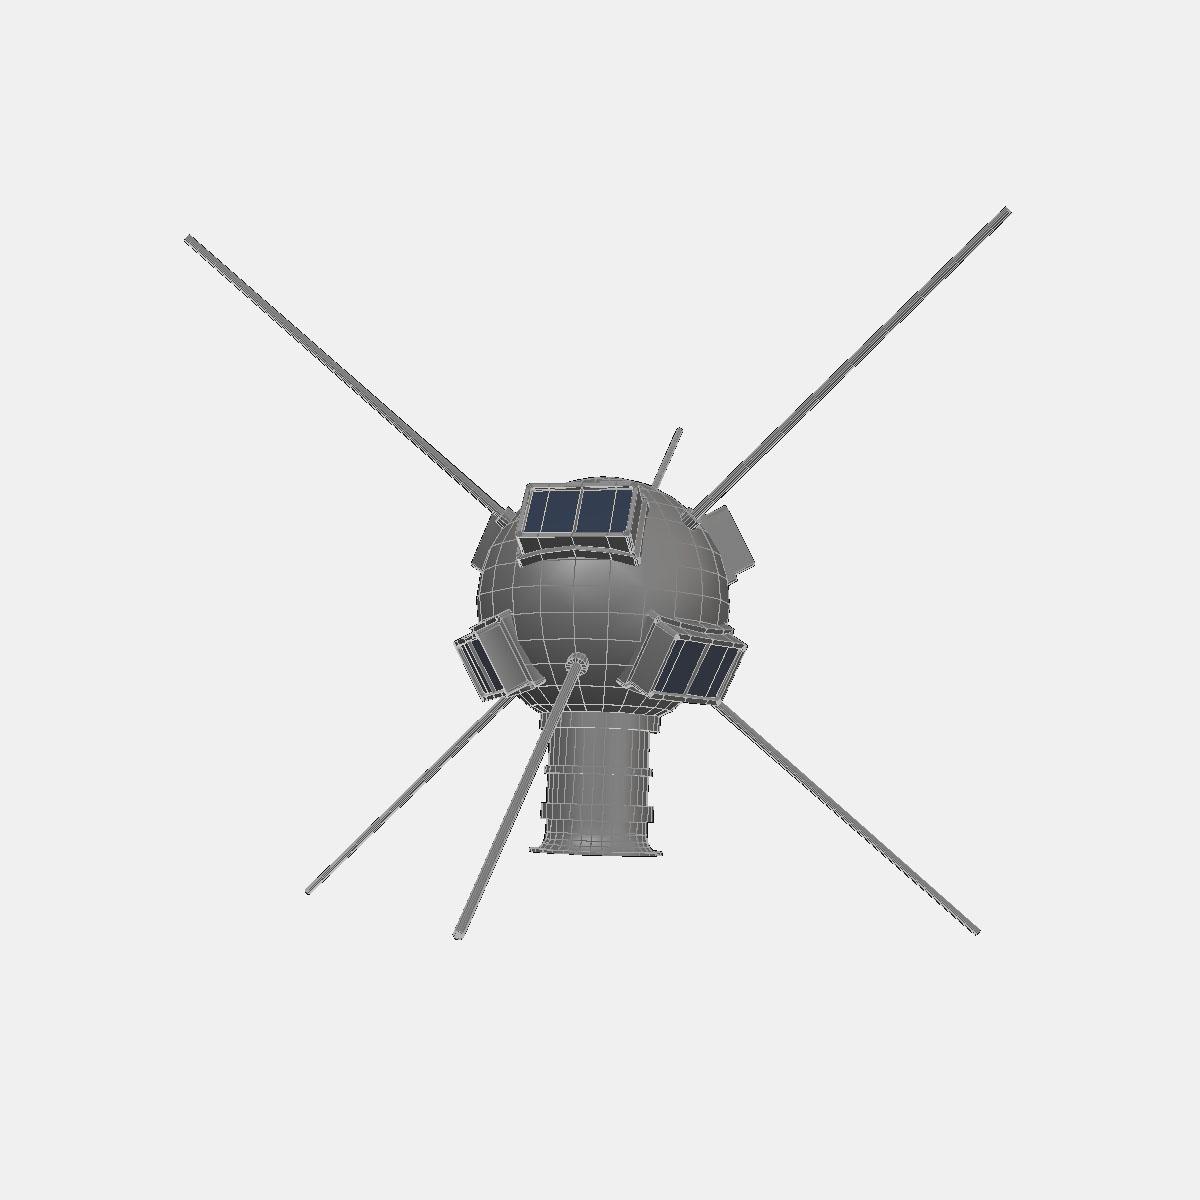 vanguard i satellite 3d model 3ds dxf fbx blend cob dae x obj 163932